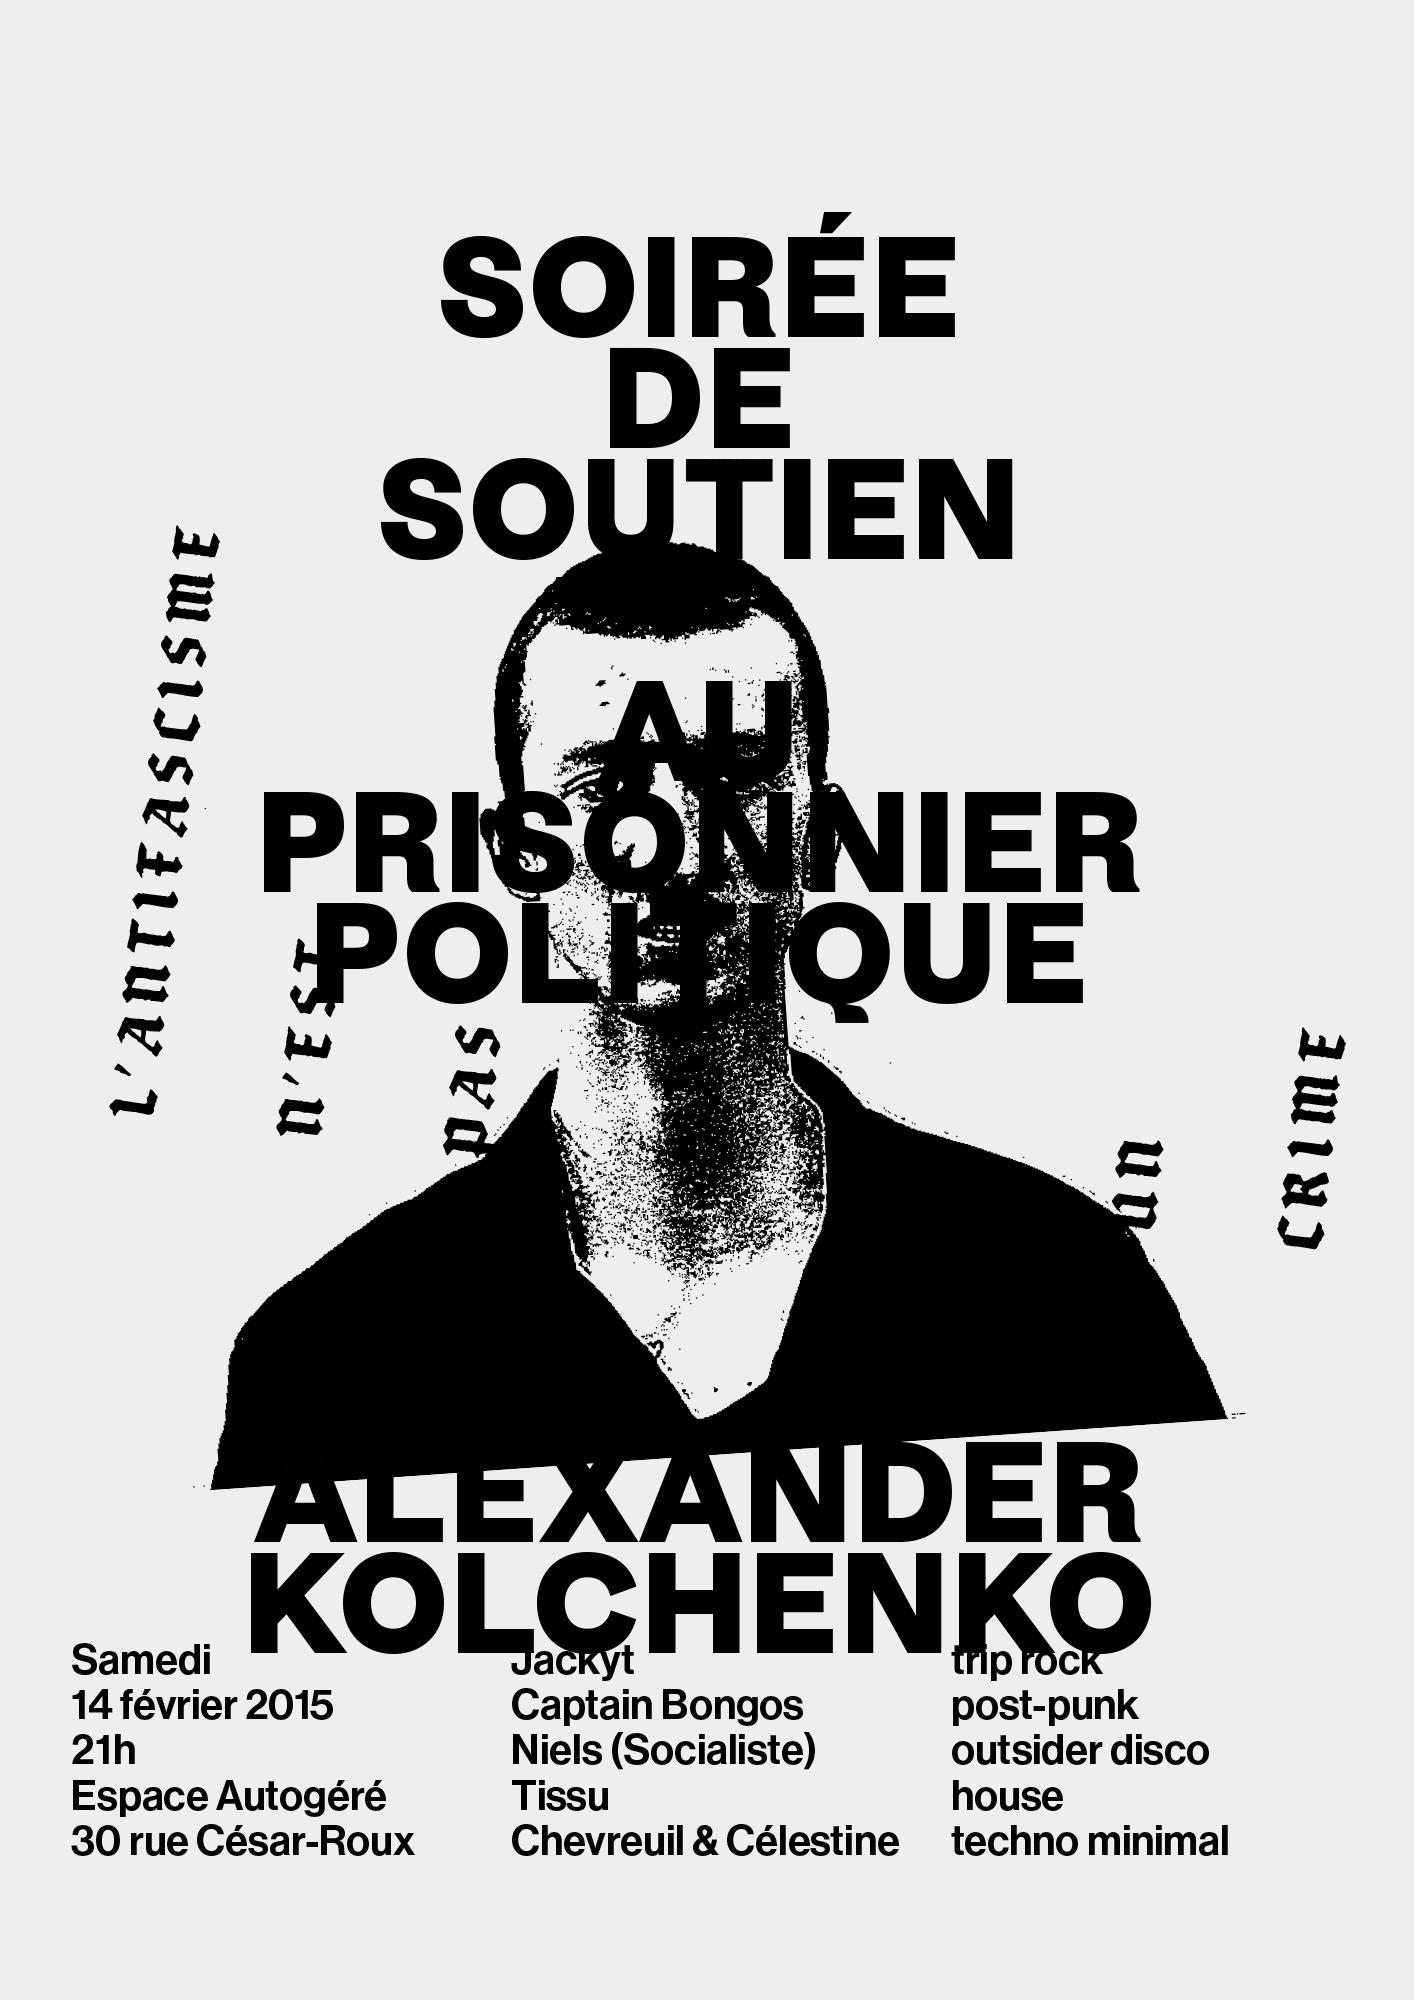 Affiche soutien Kolchenko